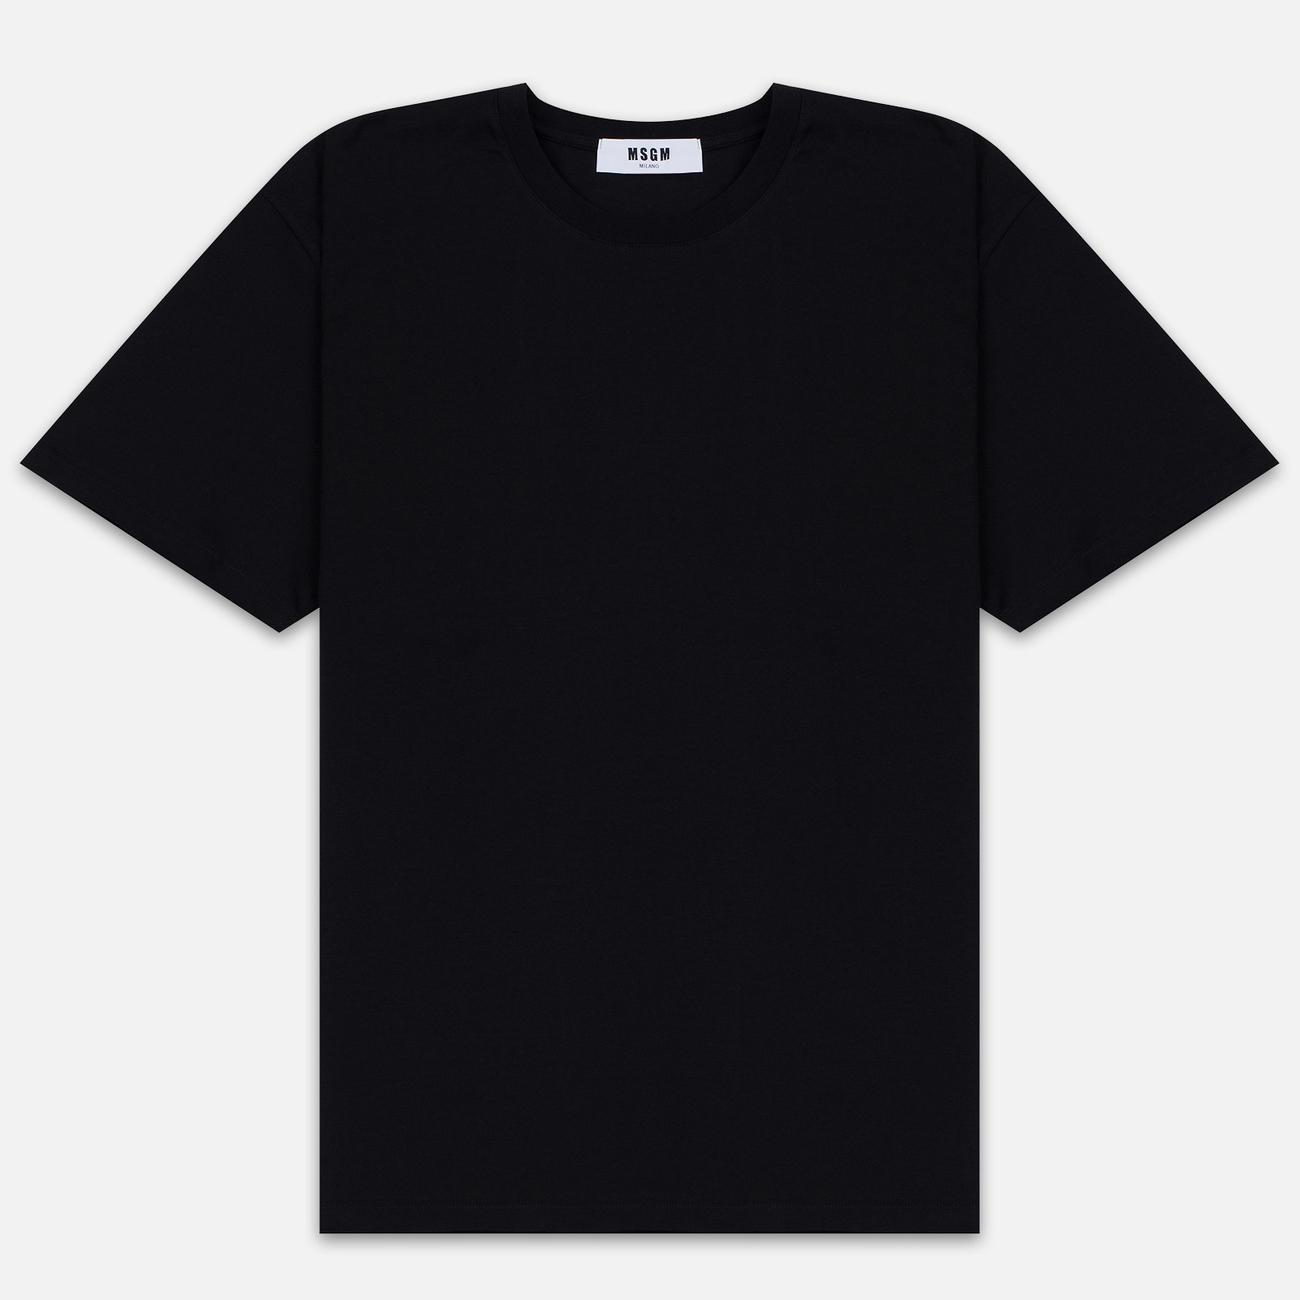 Мужская футболка MSGM Scoop Neck Back Print Black